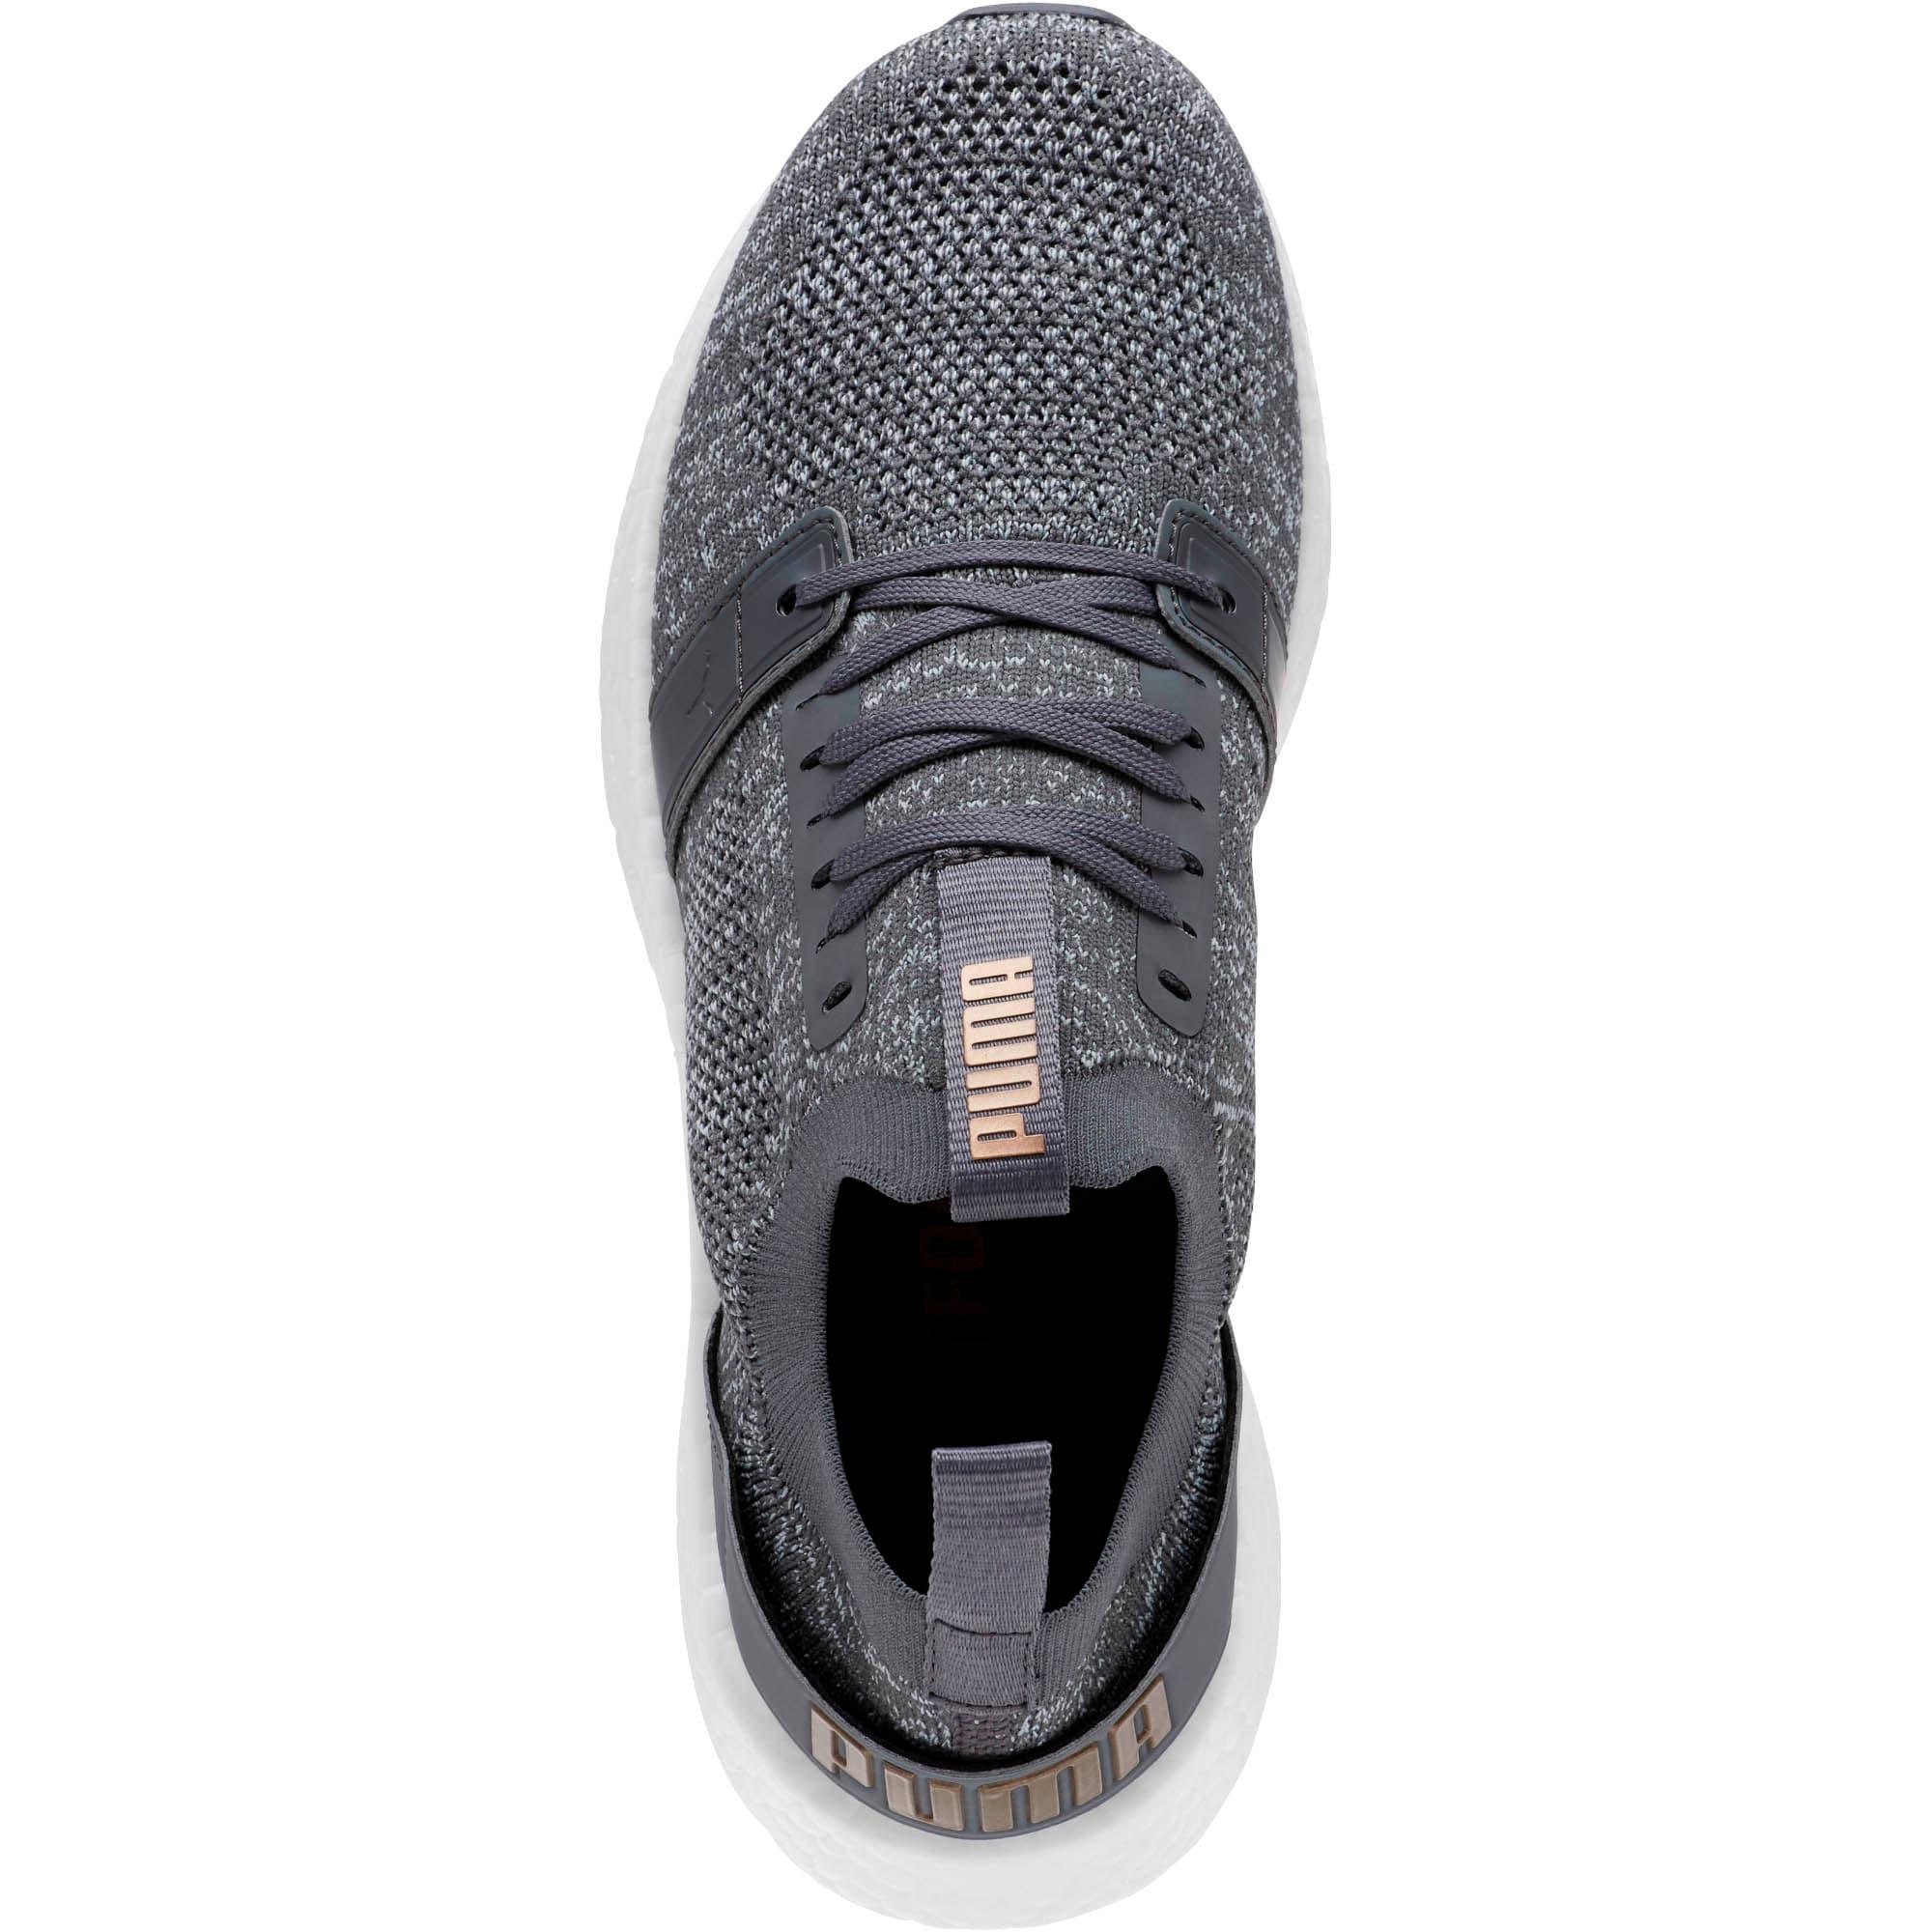 Thumbnail 5 of NRGY Neko Engineer Knit Women's Running Shoes, IronGate-Quarry-MtllicBrnze, medium